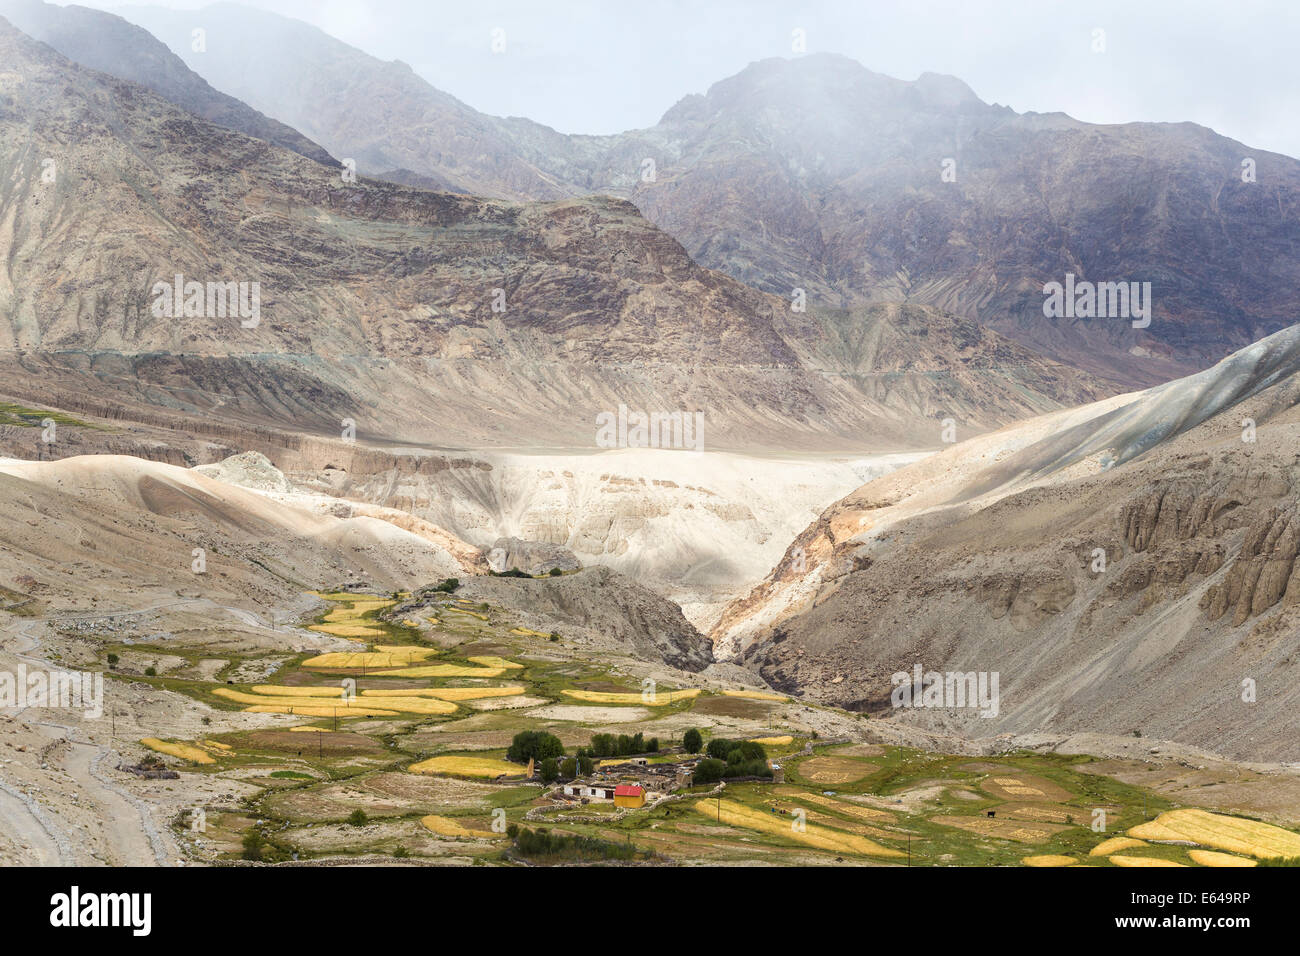 El valle de Nubra, Ladakh, India Imagen De Stock